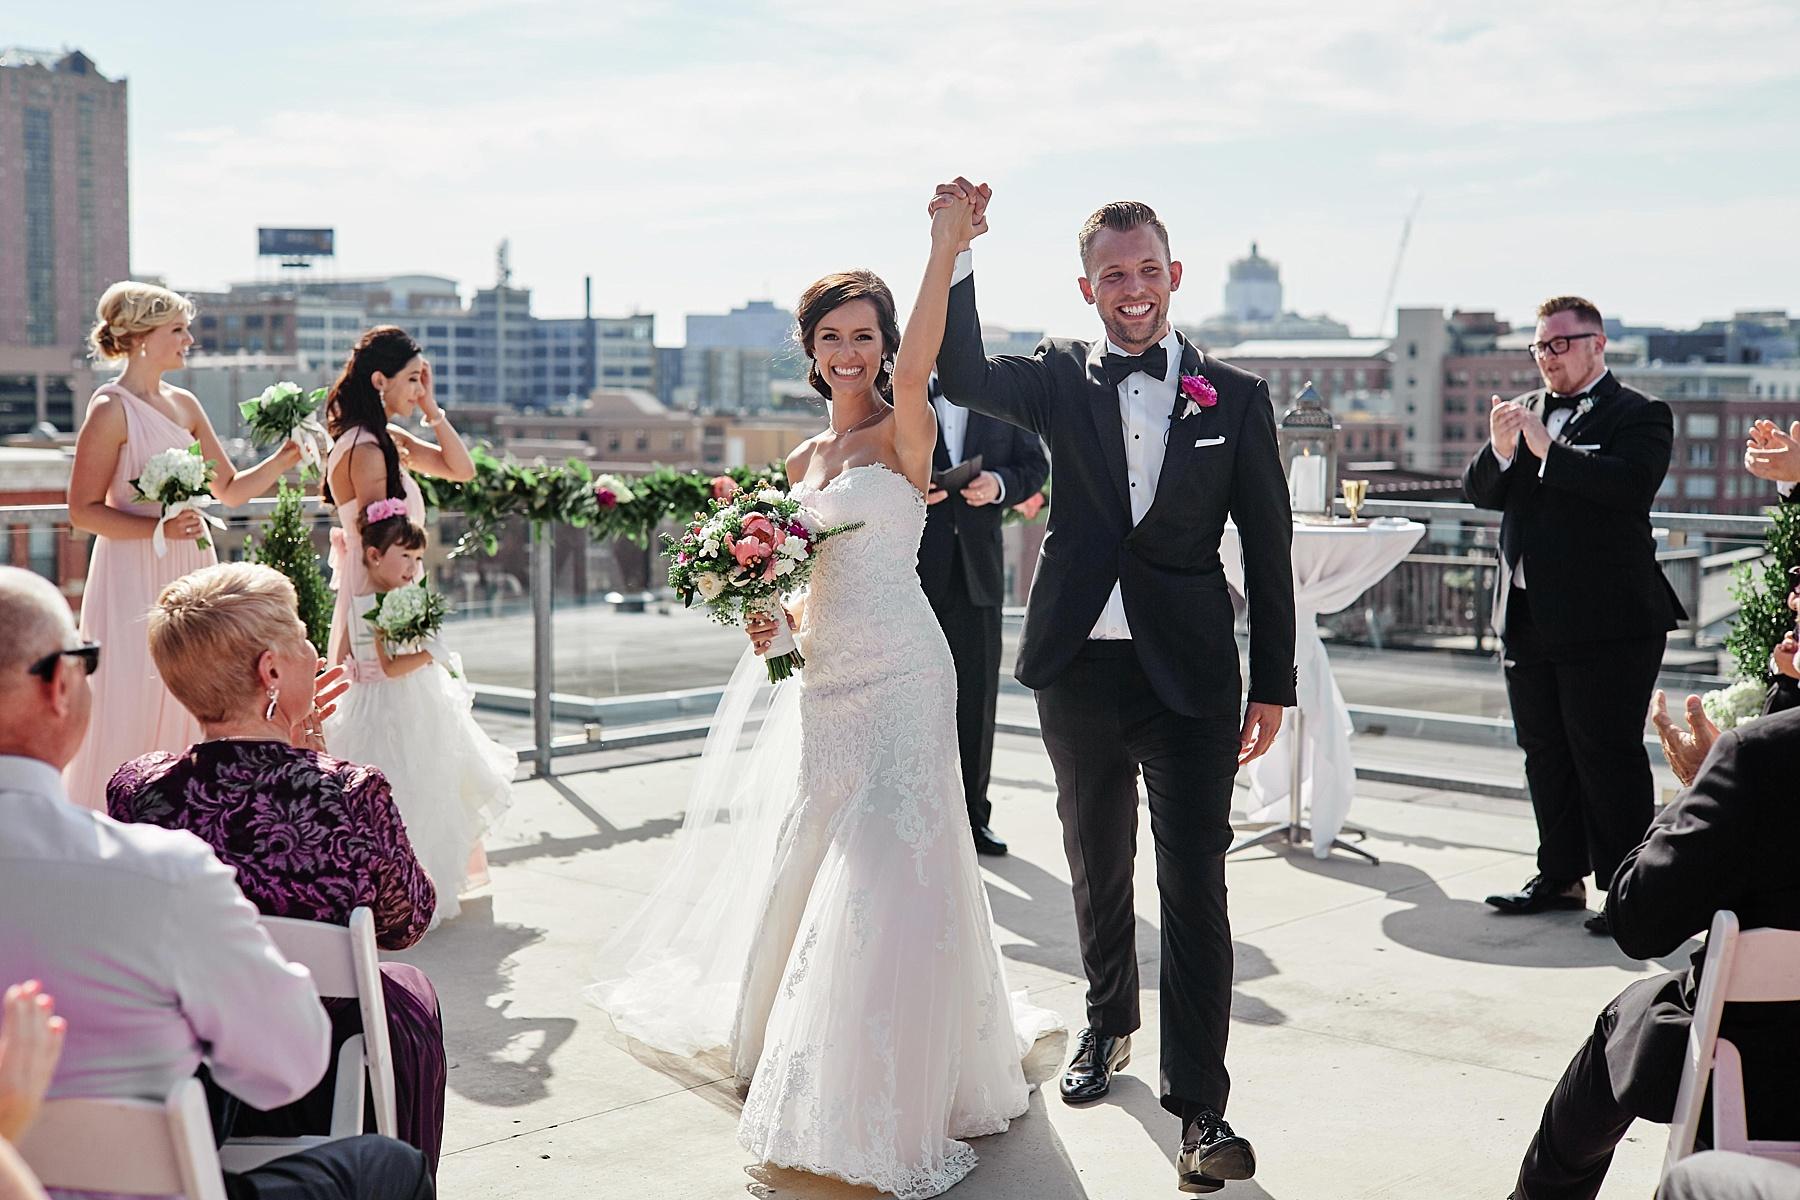 ABULAE-Wedding-Saint-paul-MN-Josh-Sofia-Wedding-Mears-Park_0775.jpg